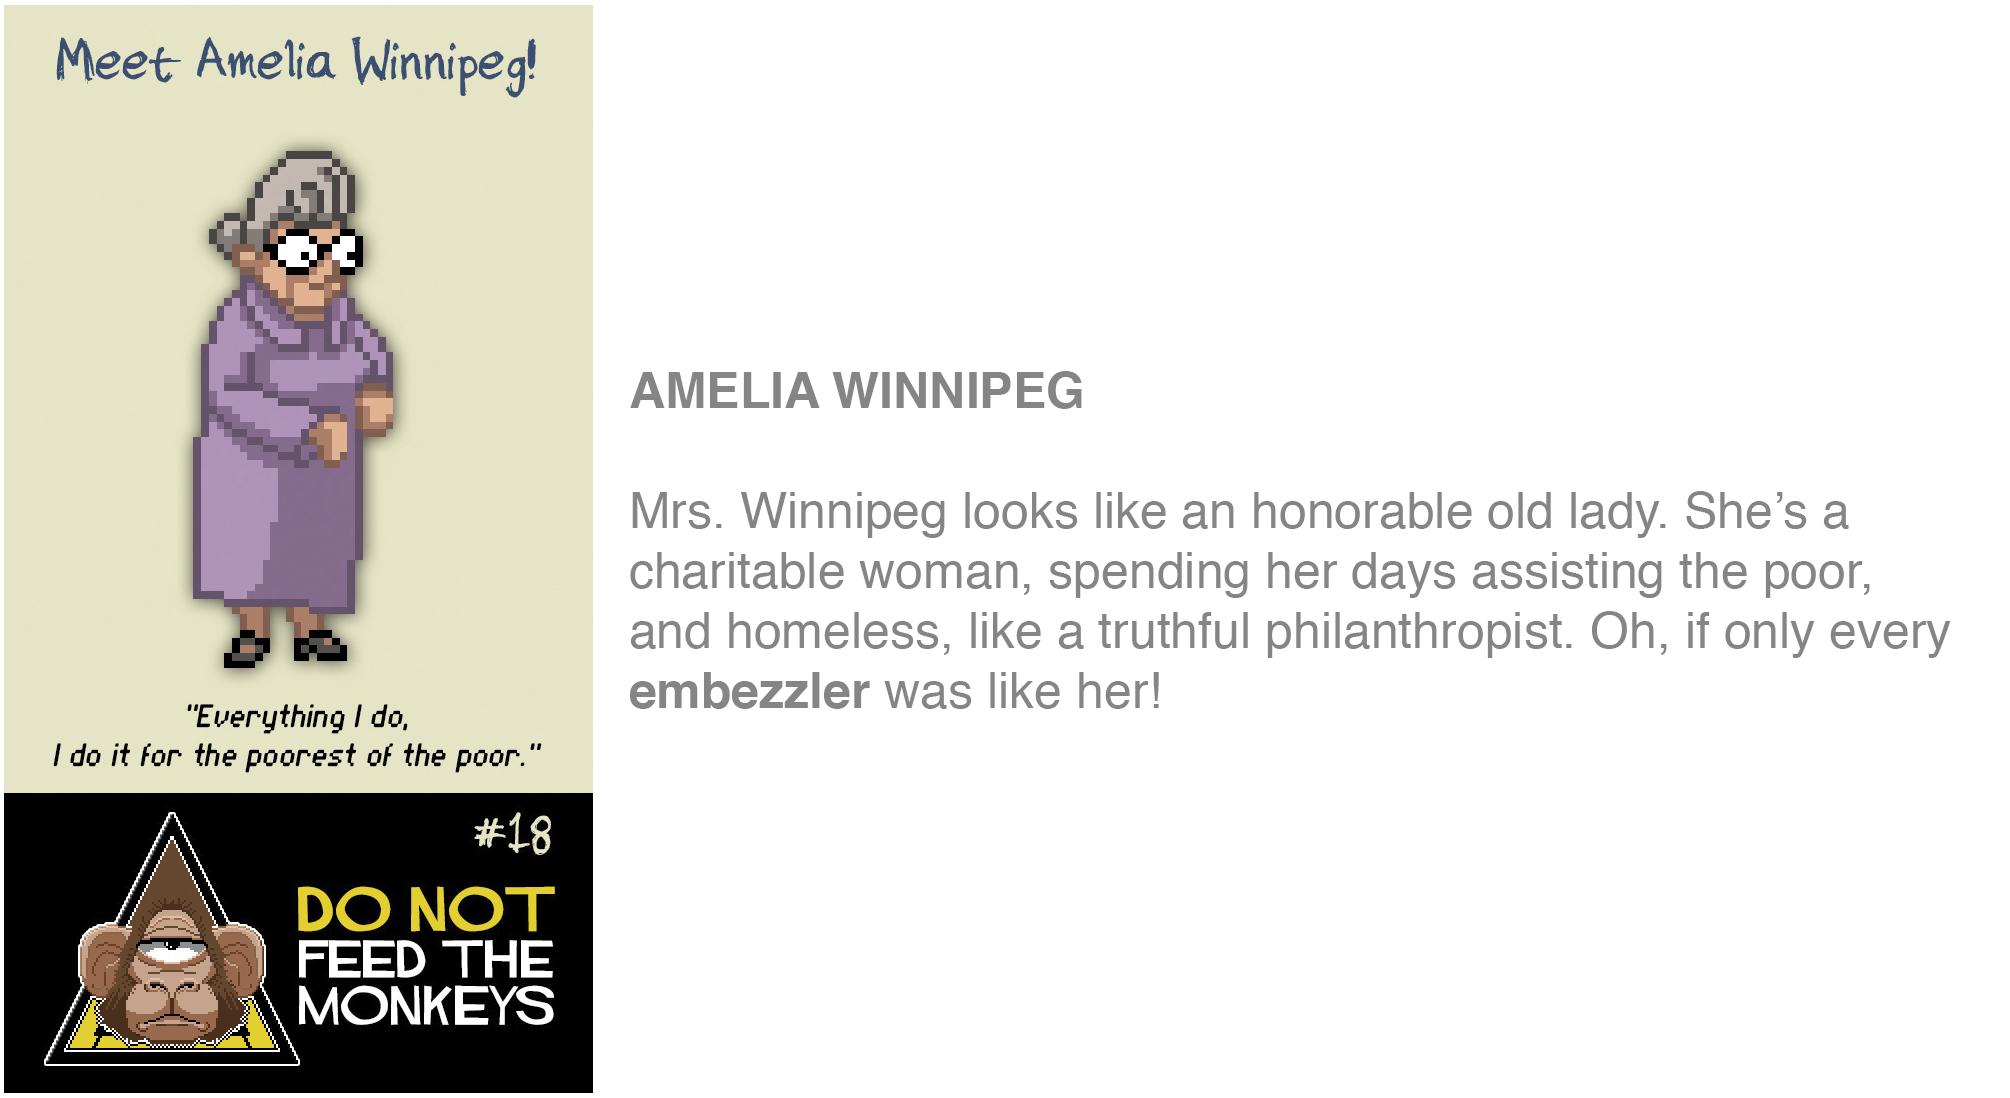 Amelia Winnipeg